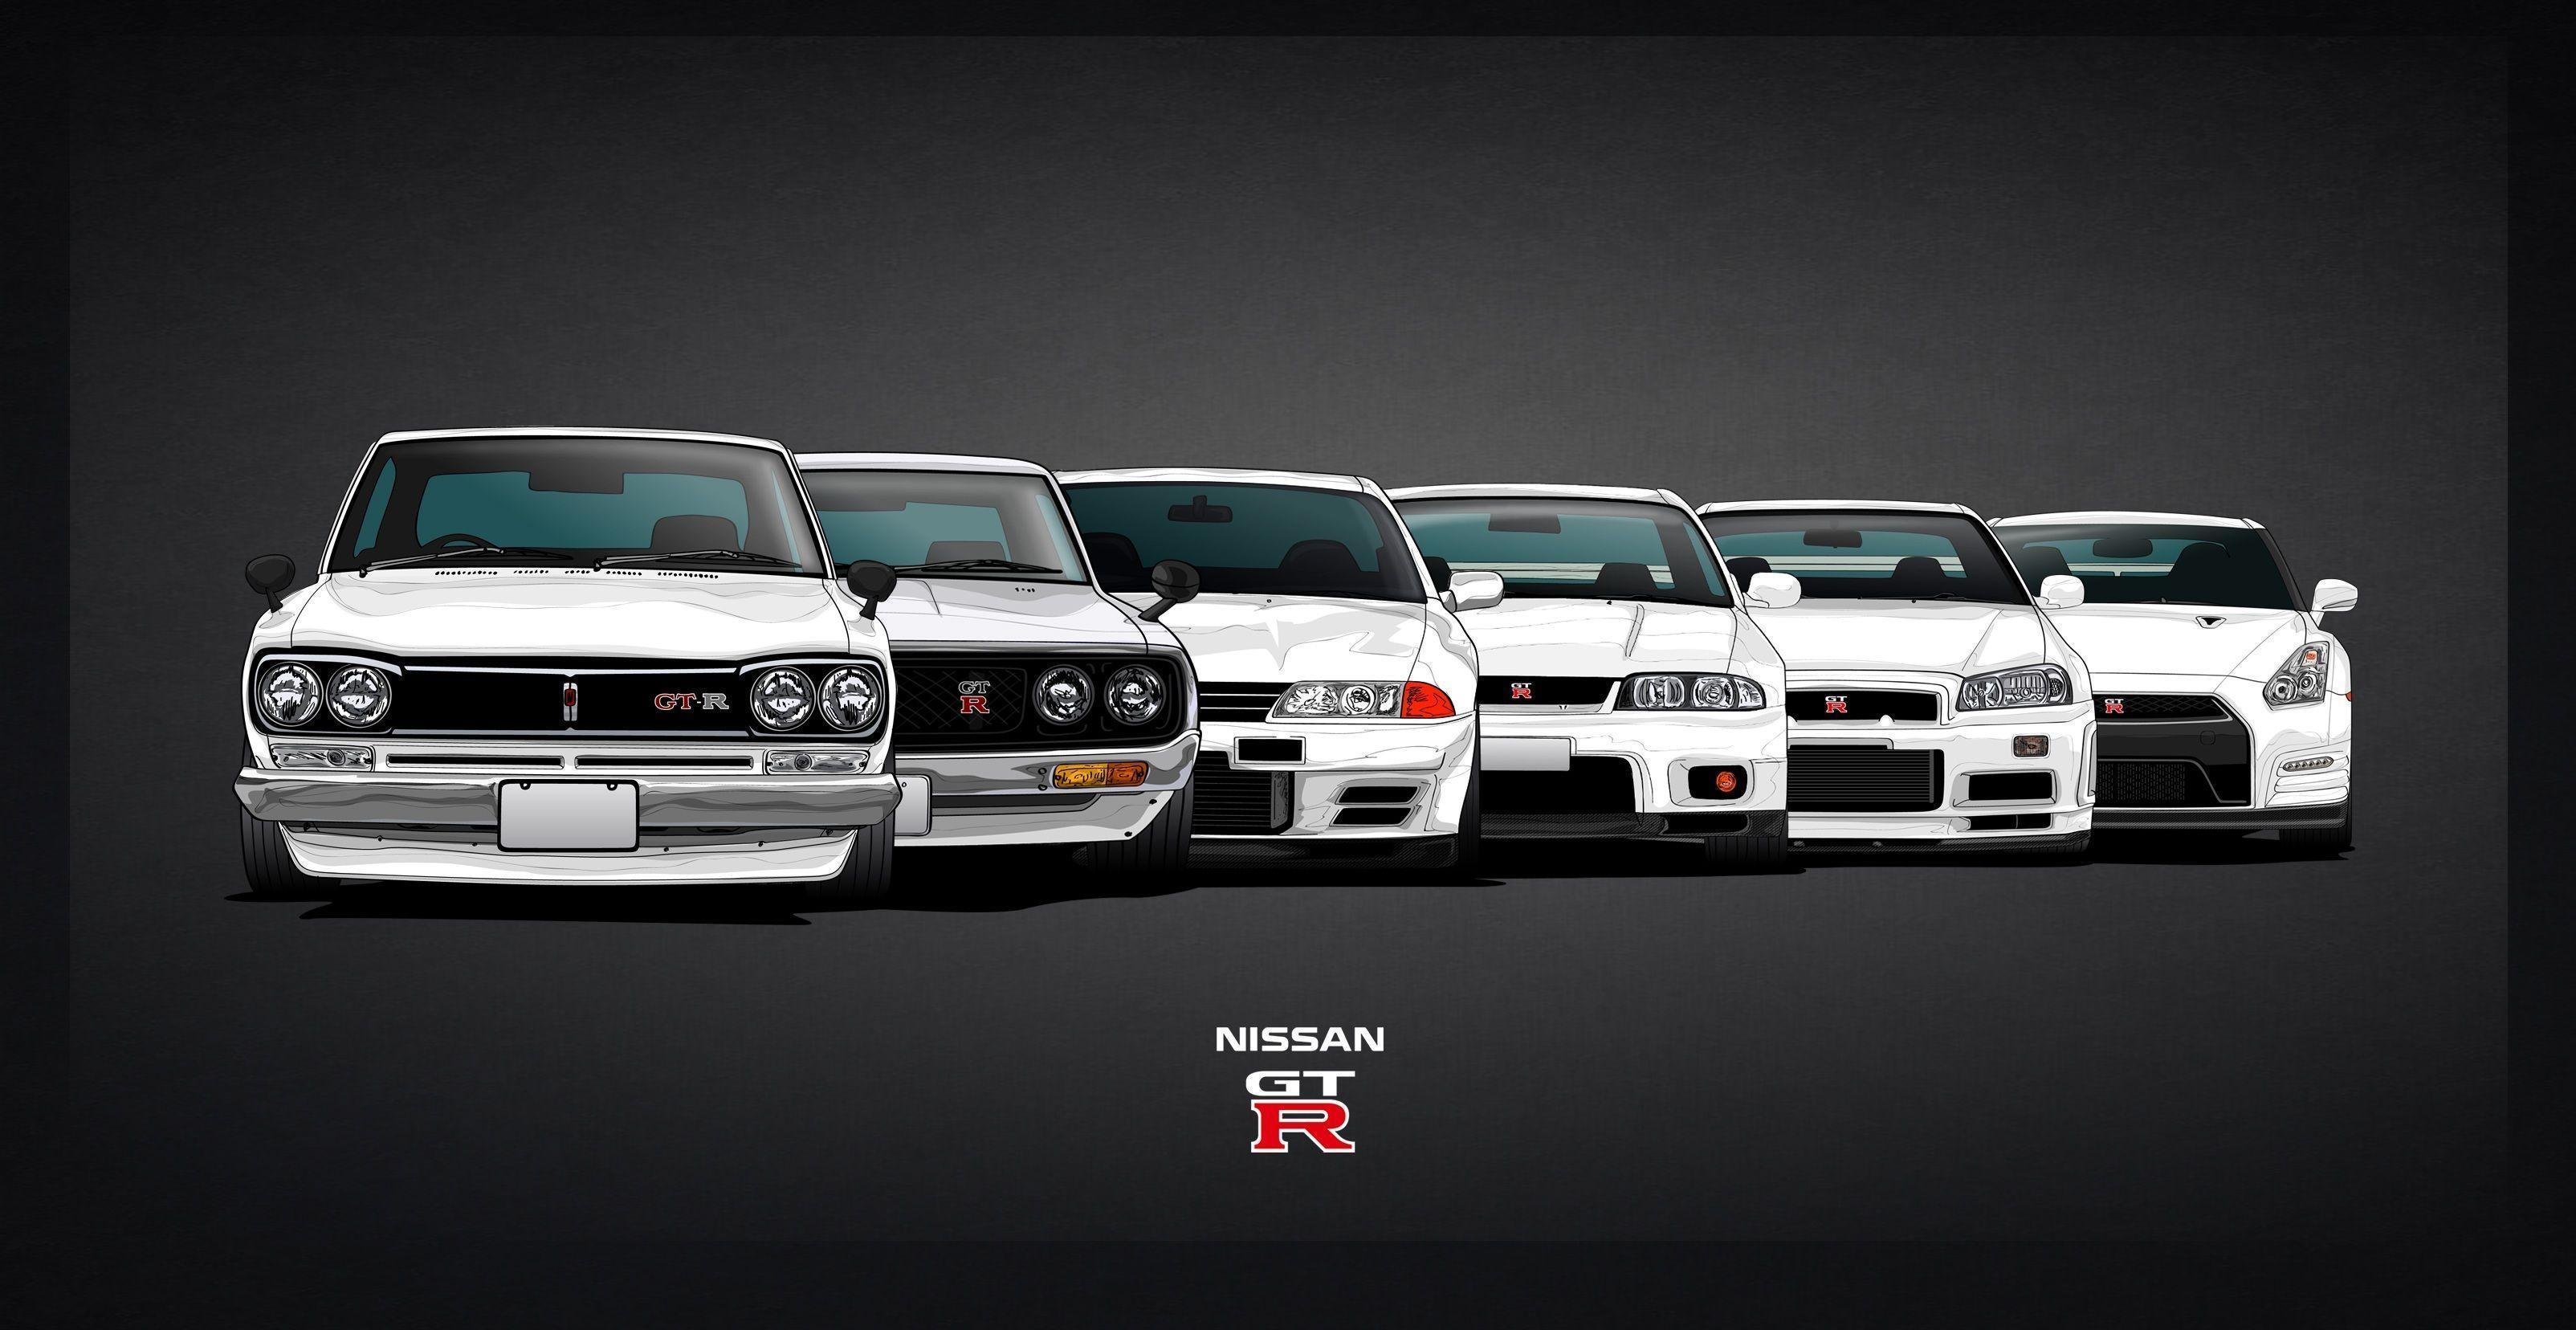 Nissan GTR Evolution [3208x1656] : wallpapers